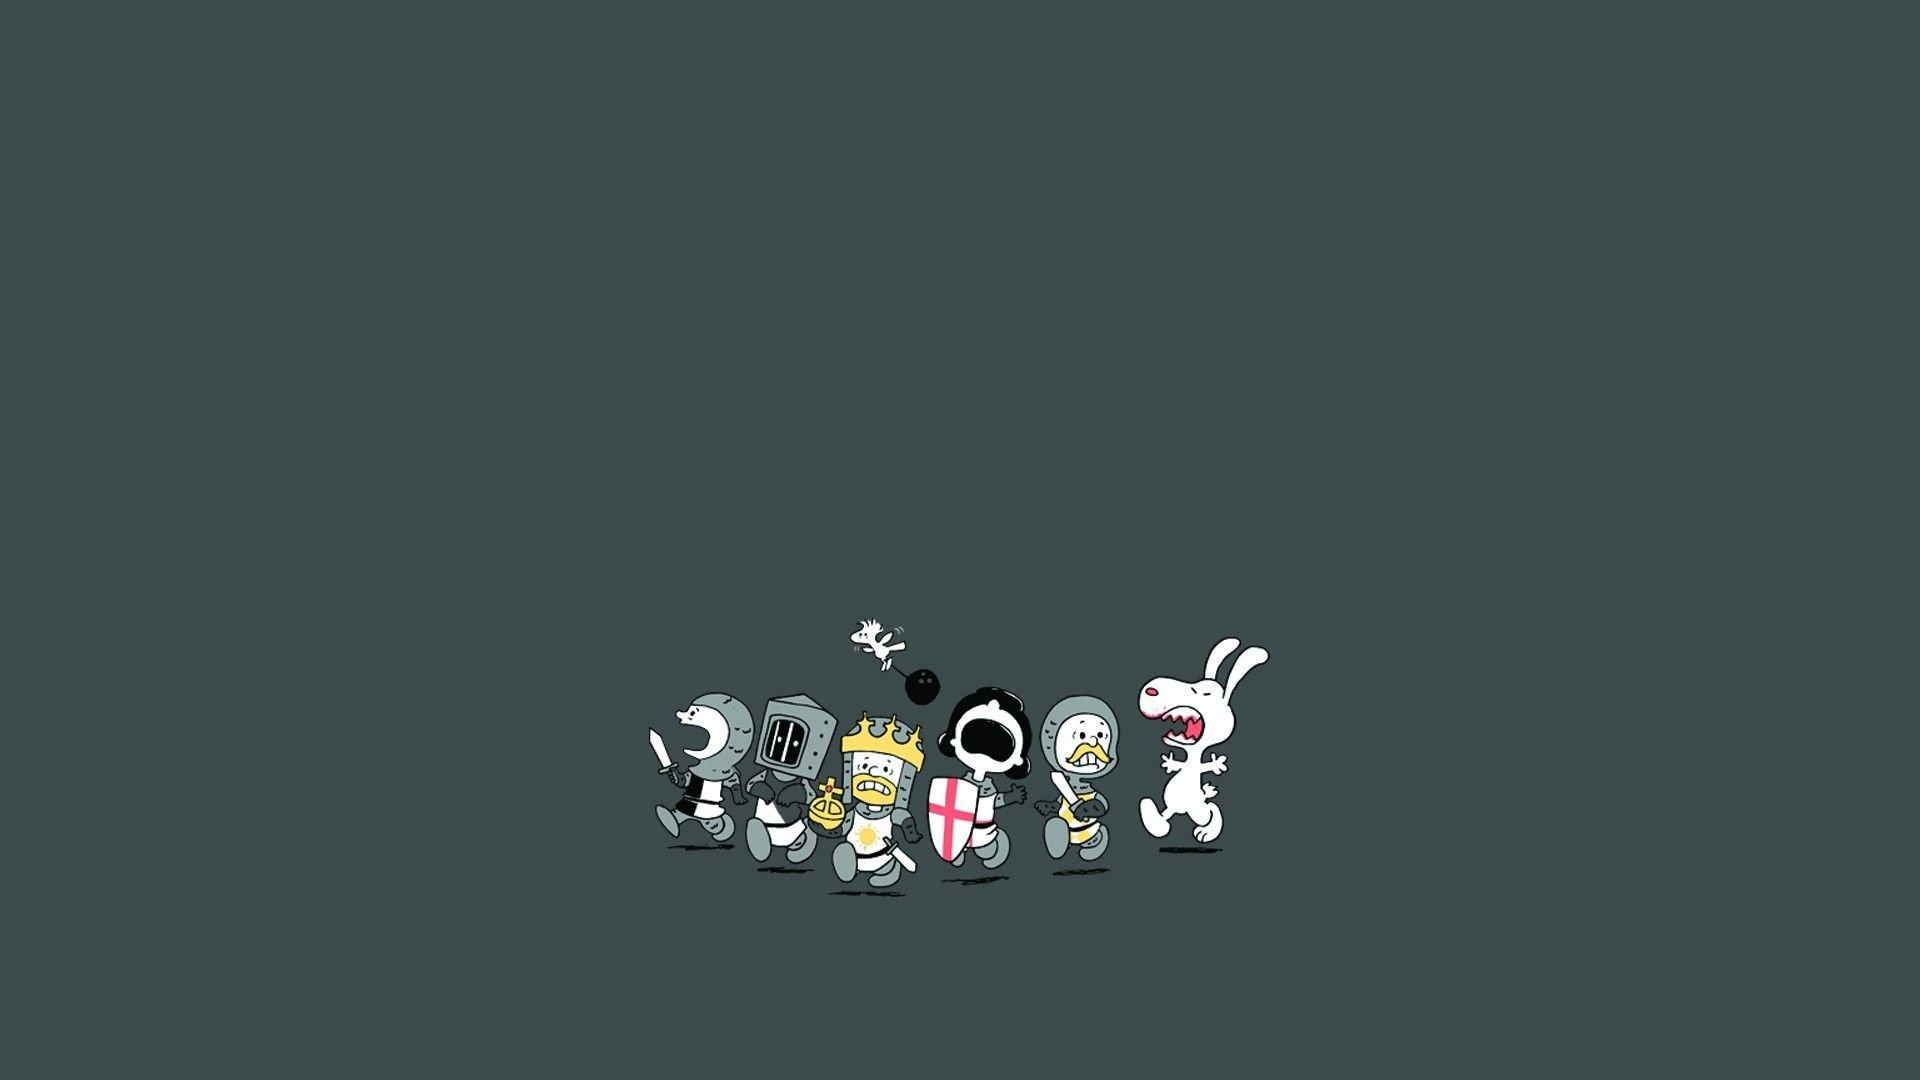 Desktop Snoopy HD Wallpapers